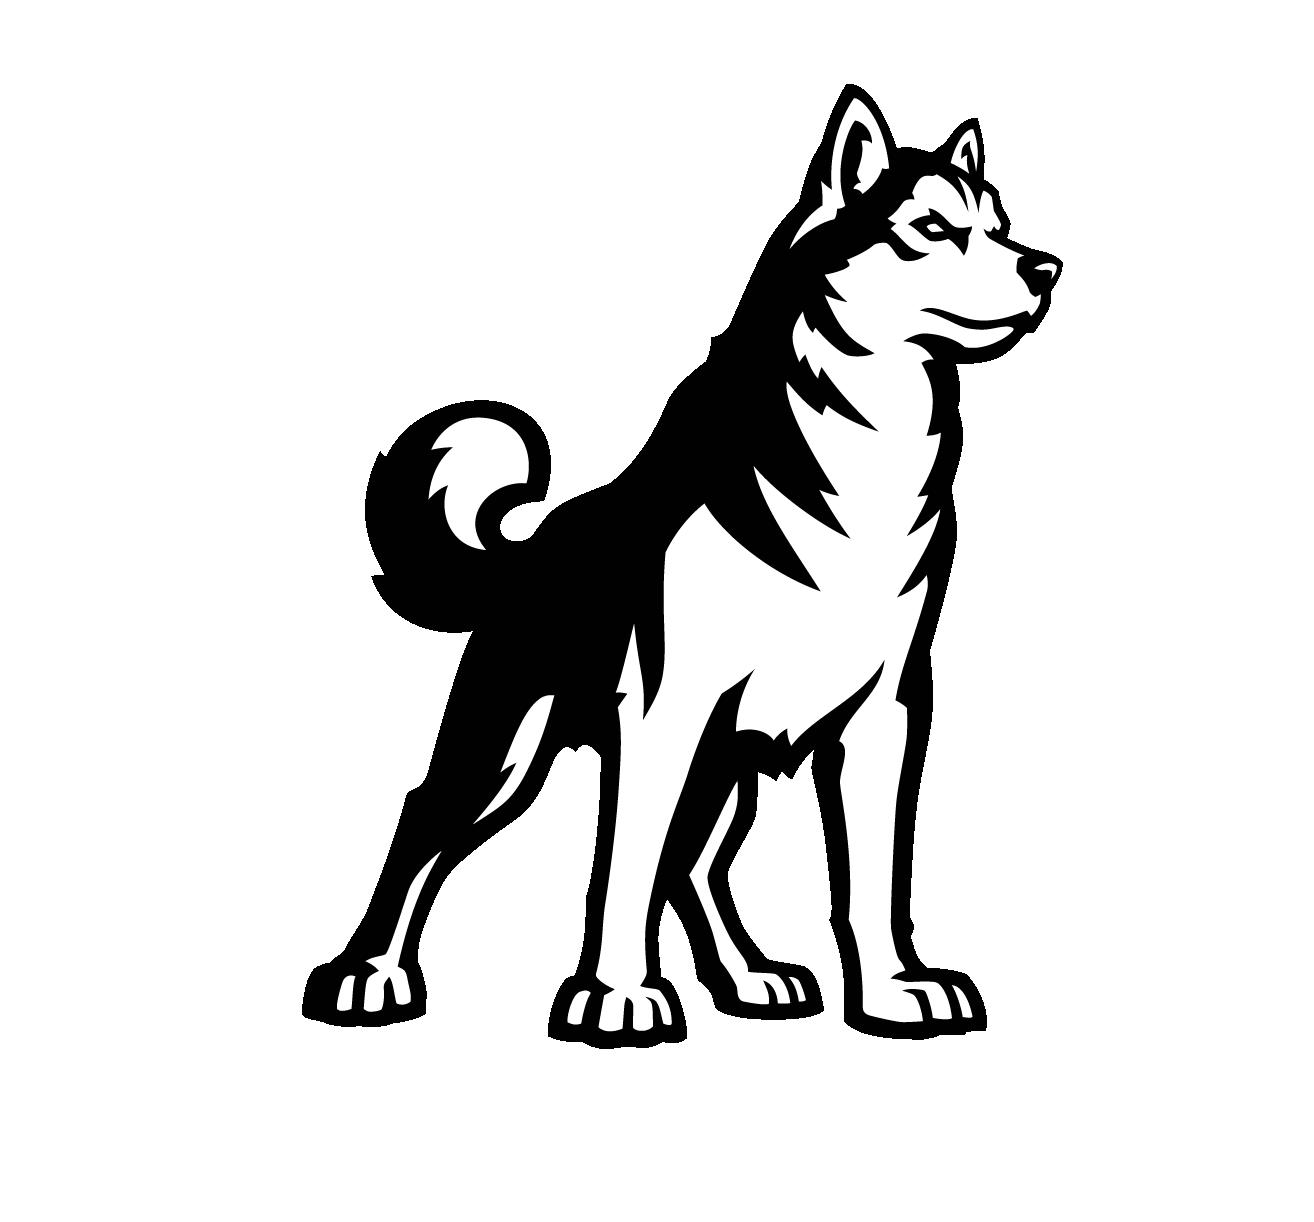 Husky clipart dog indian. Mammal vertebrate canidae carnivore